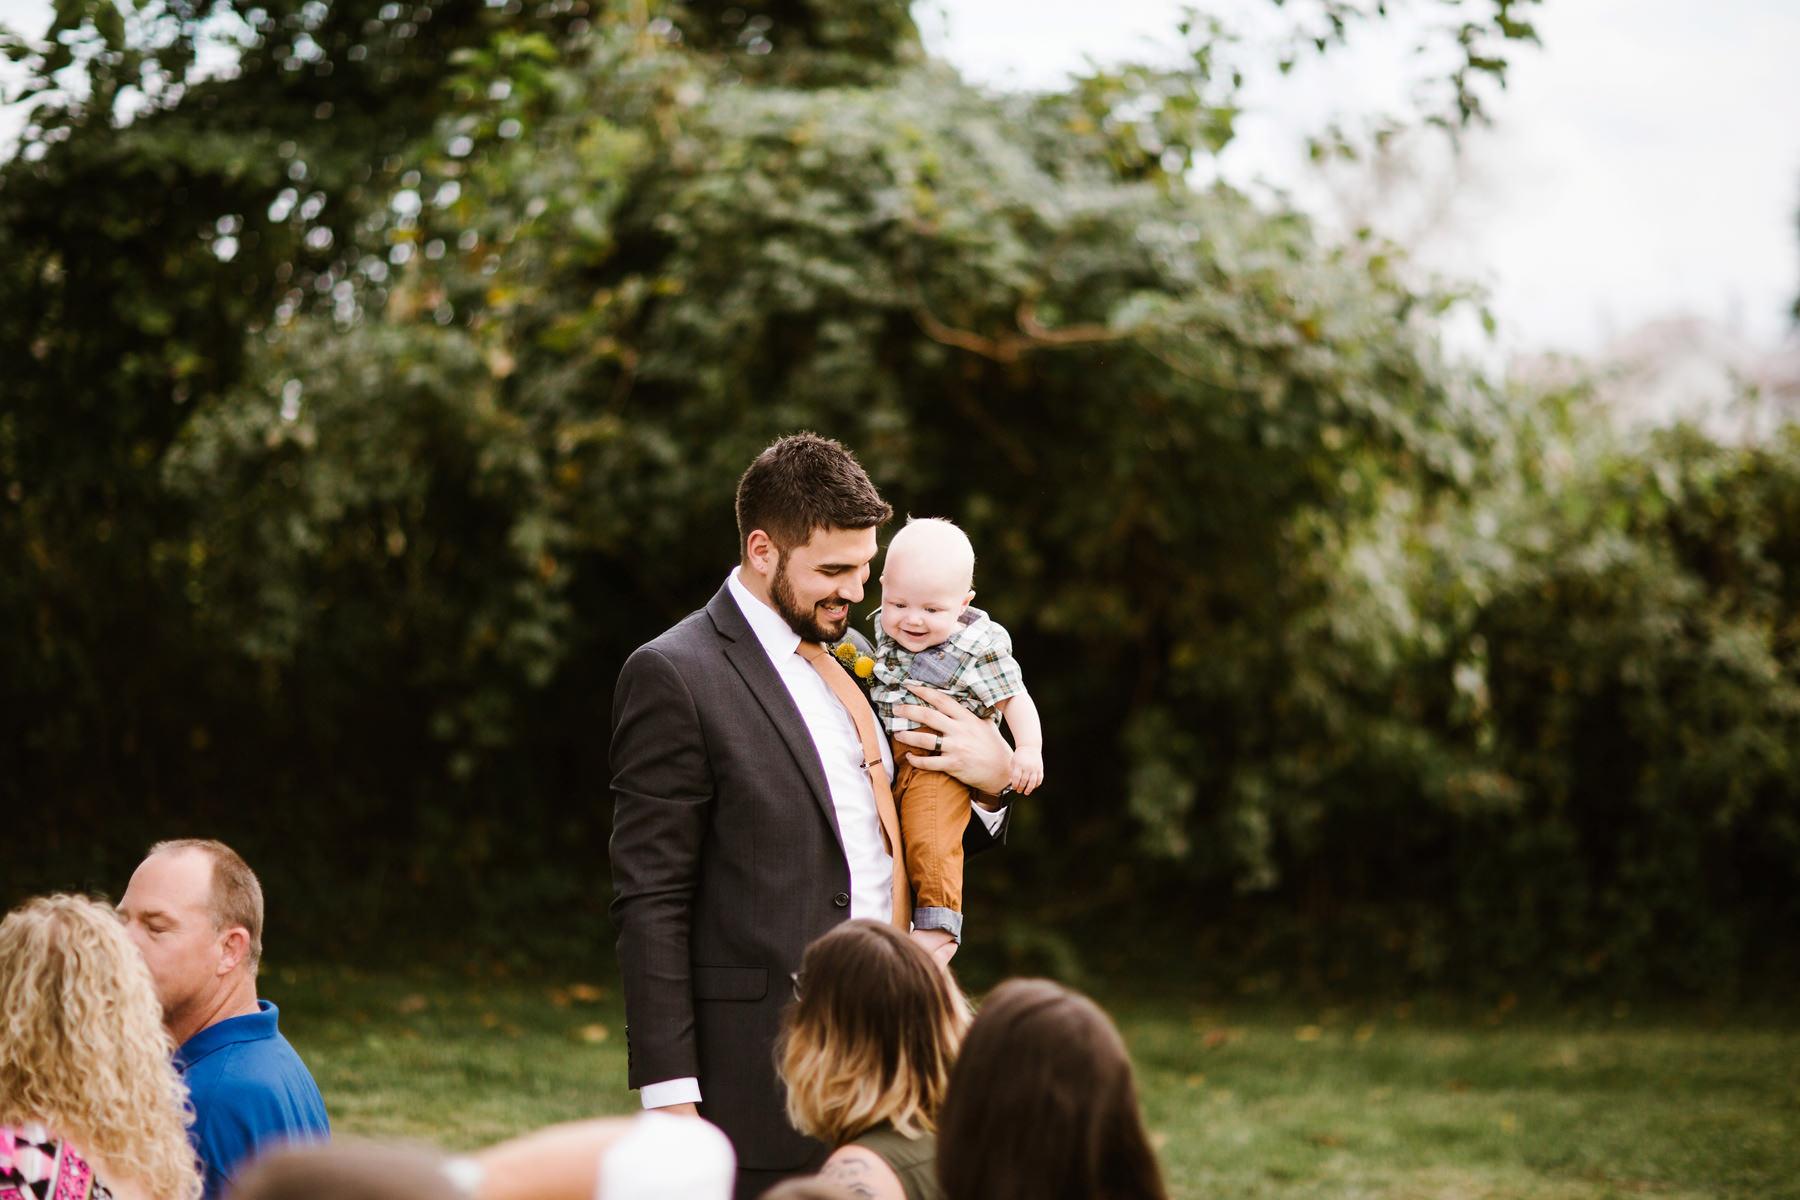 Alldredge Orchard Kansas City_Kindling Wedding Photography BLOG 48.JPG